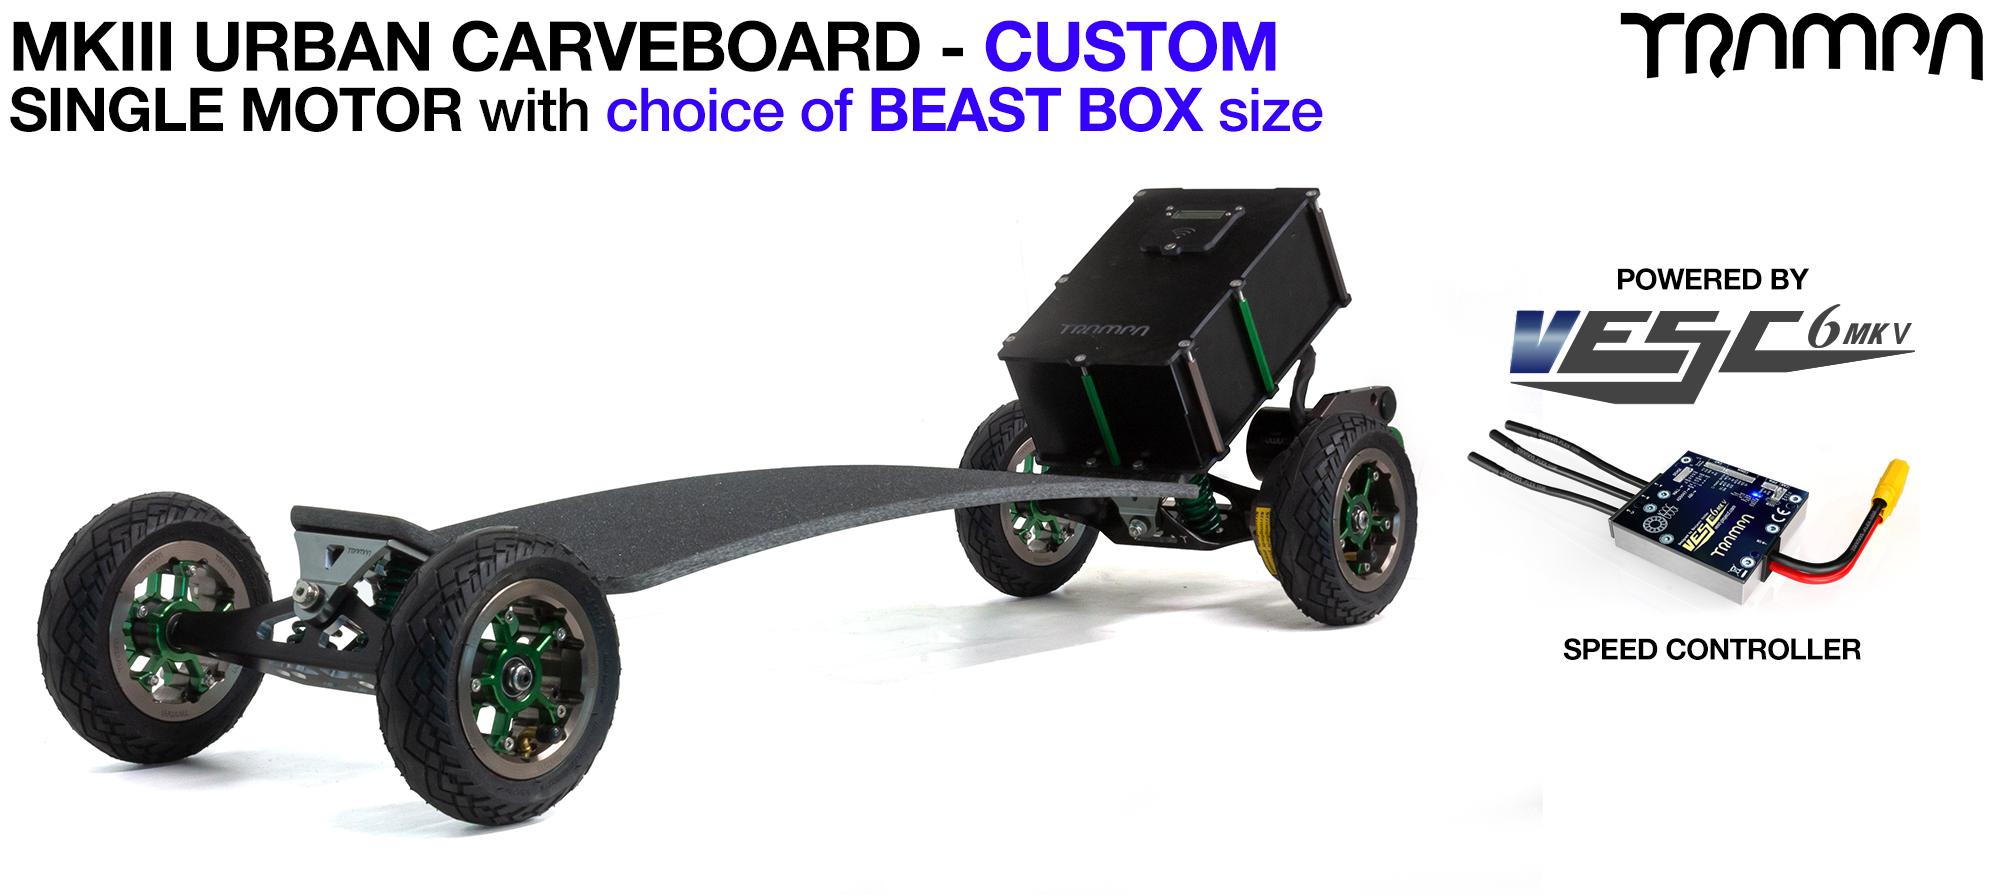 TRAMPA's MkIII Electric URBAN Carveboard - uses Mini Spring Trucks with MkIII Carve board Motor Mount,s Custom TRAMPA hubs & 125mm URBAN longboard Tyres - SINGLE Motor CUSTOM